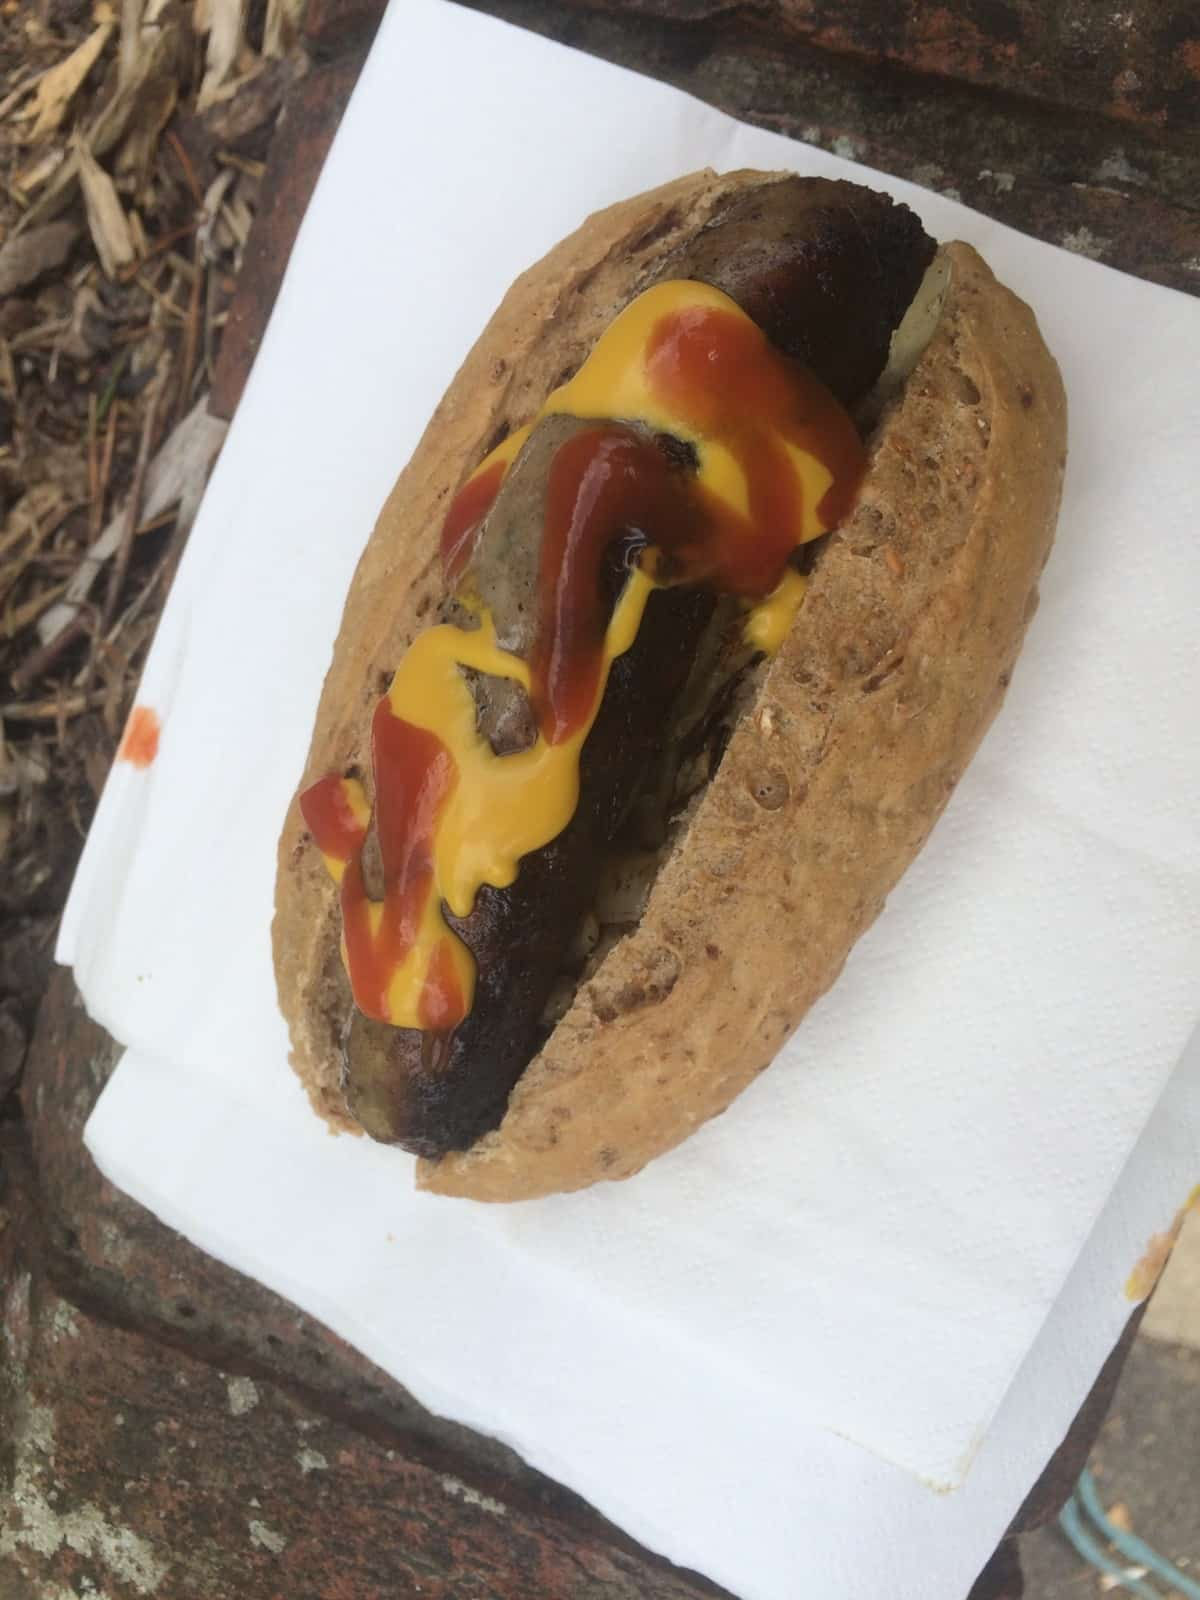 Goat hotdog